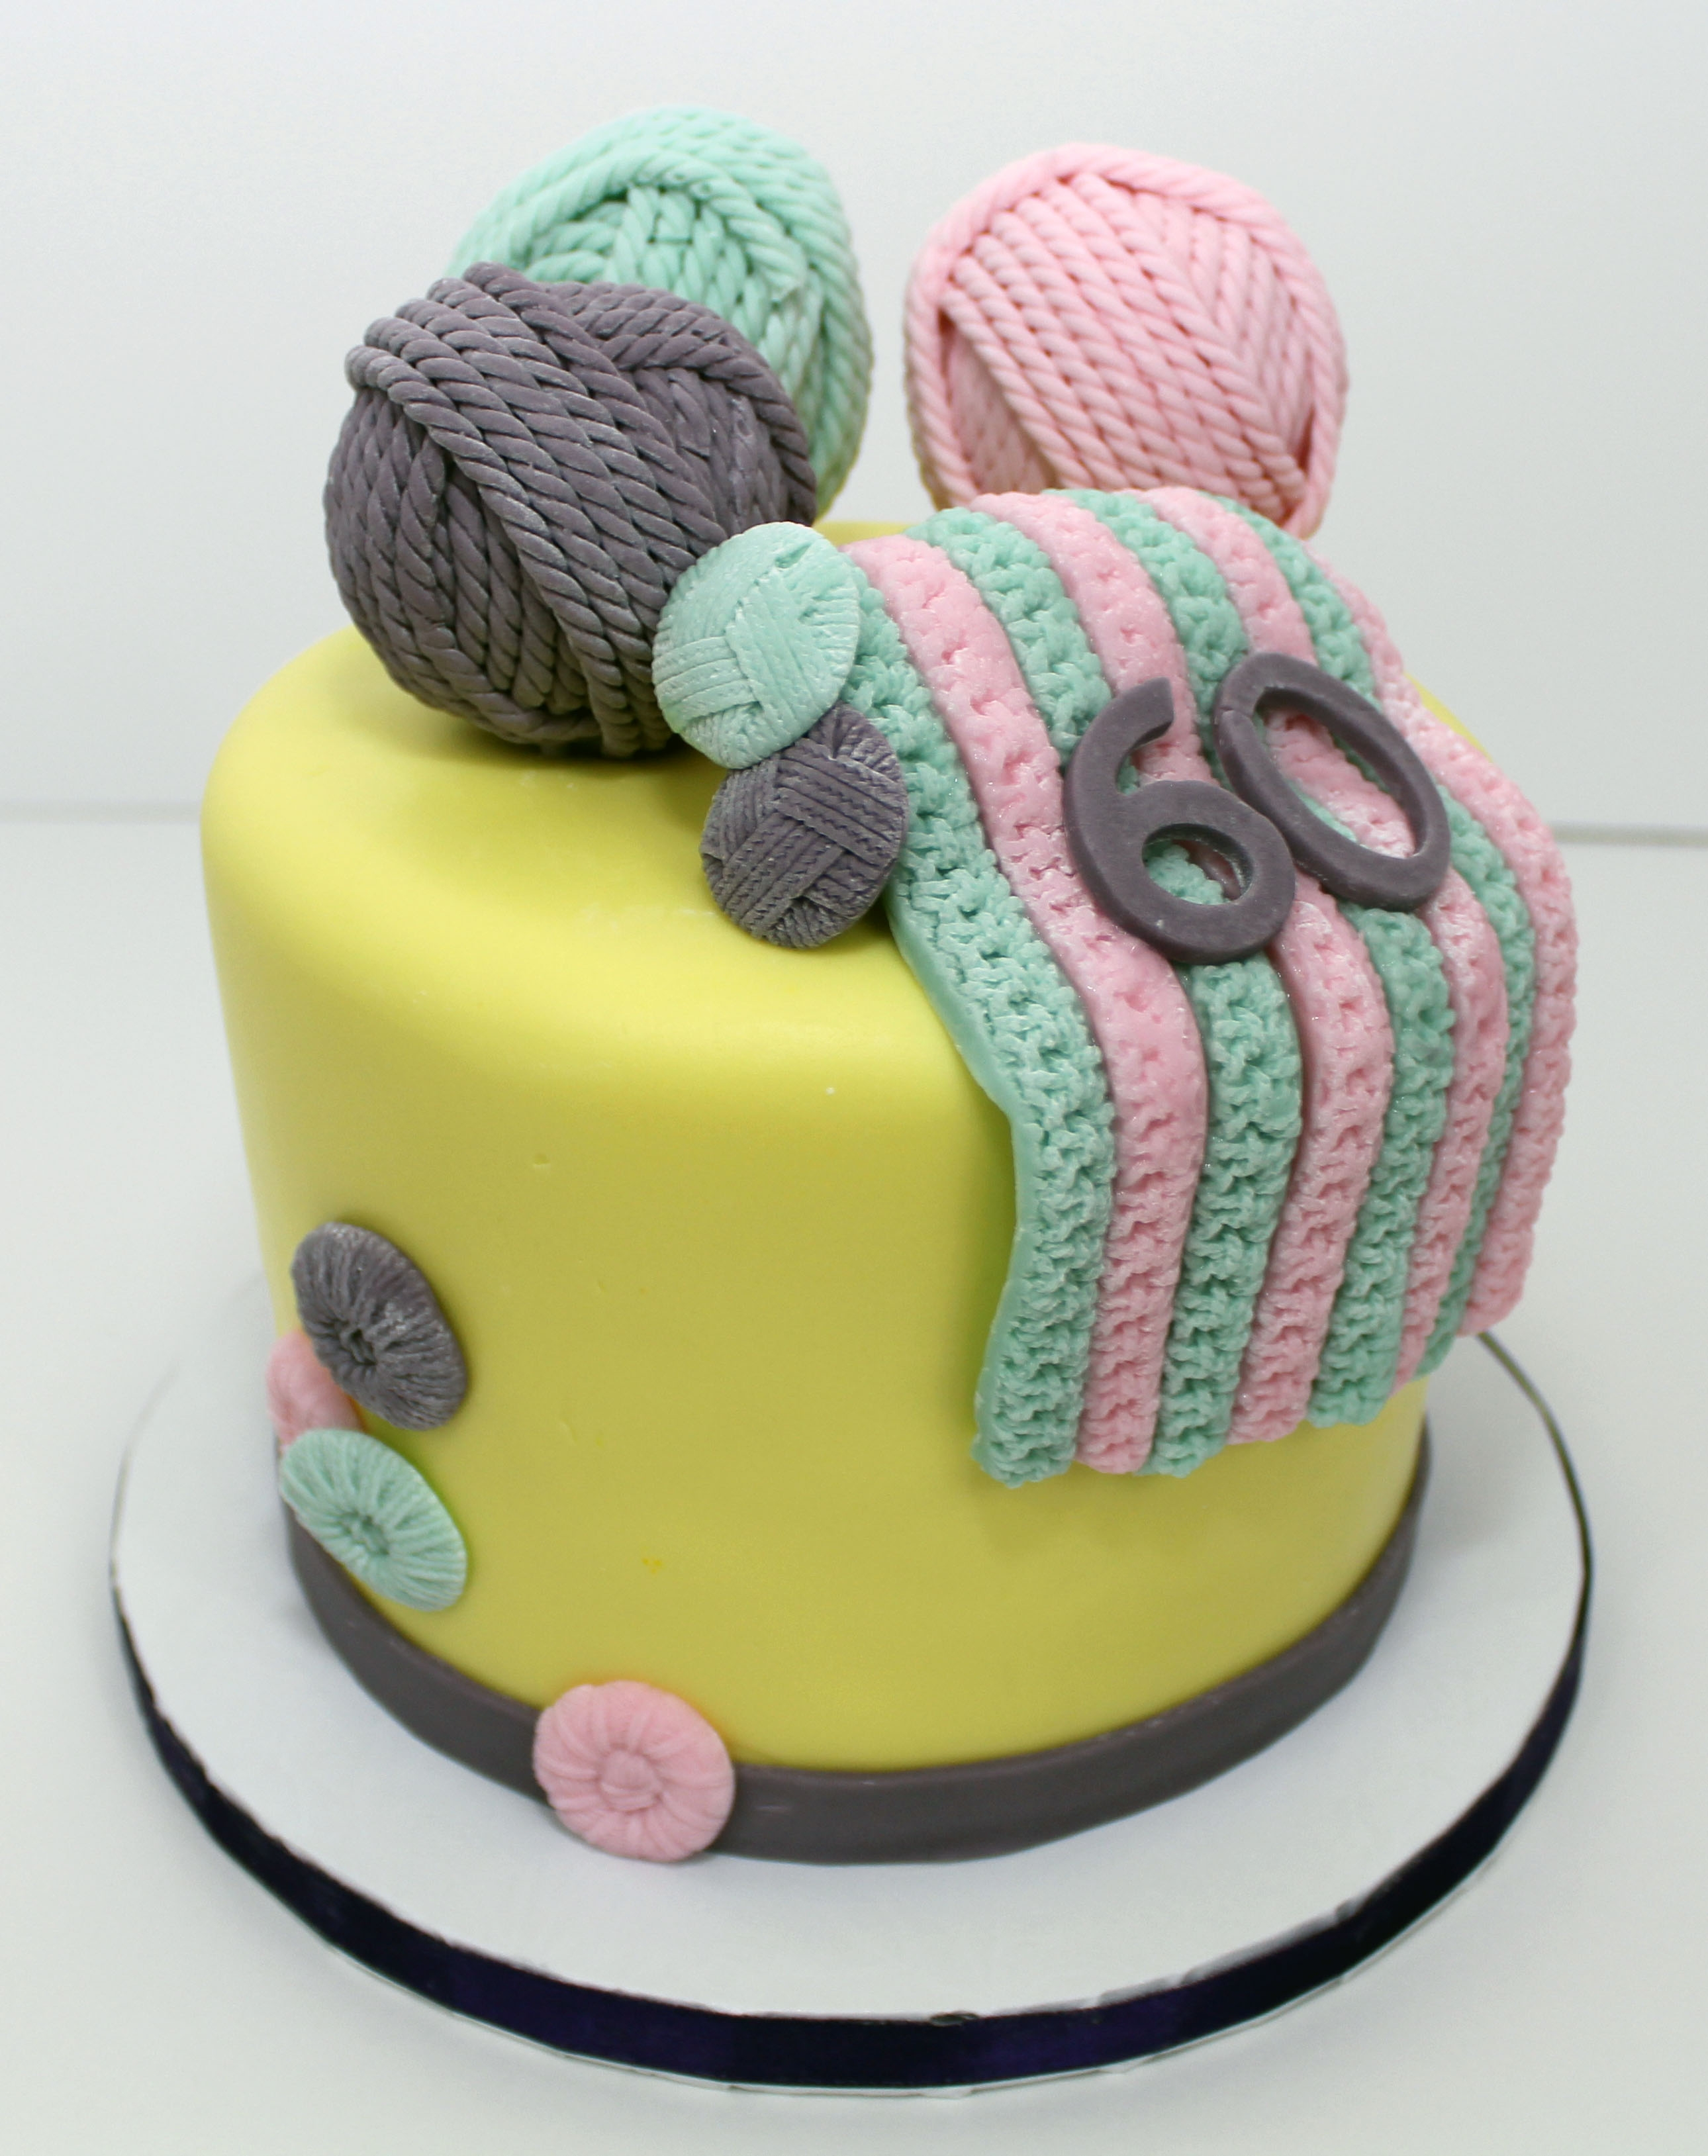 Knitting Cake Decorations : Knitting theme birthday cake cakecentral